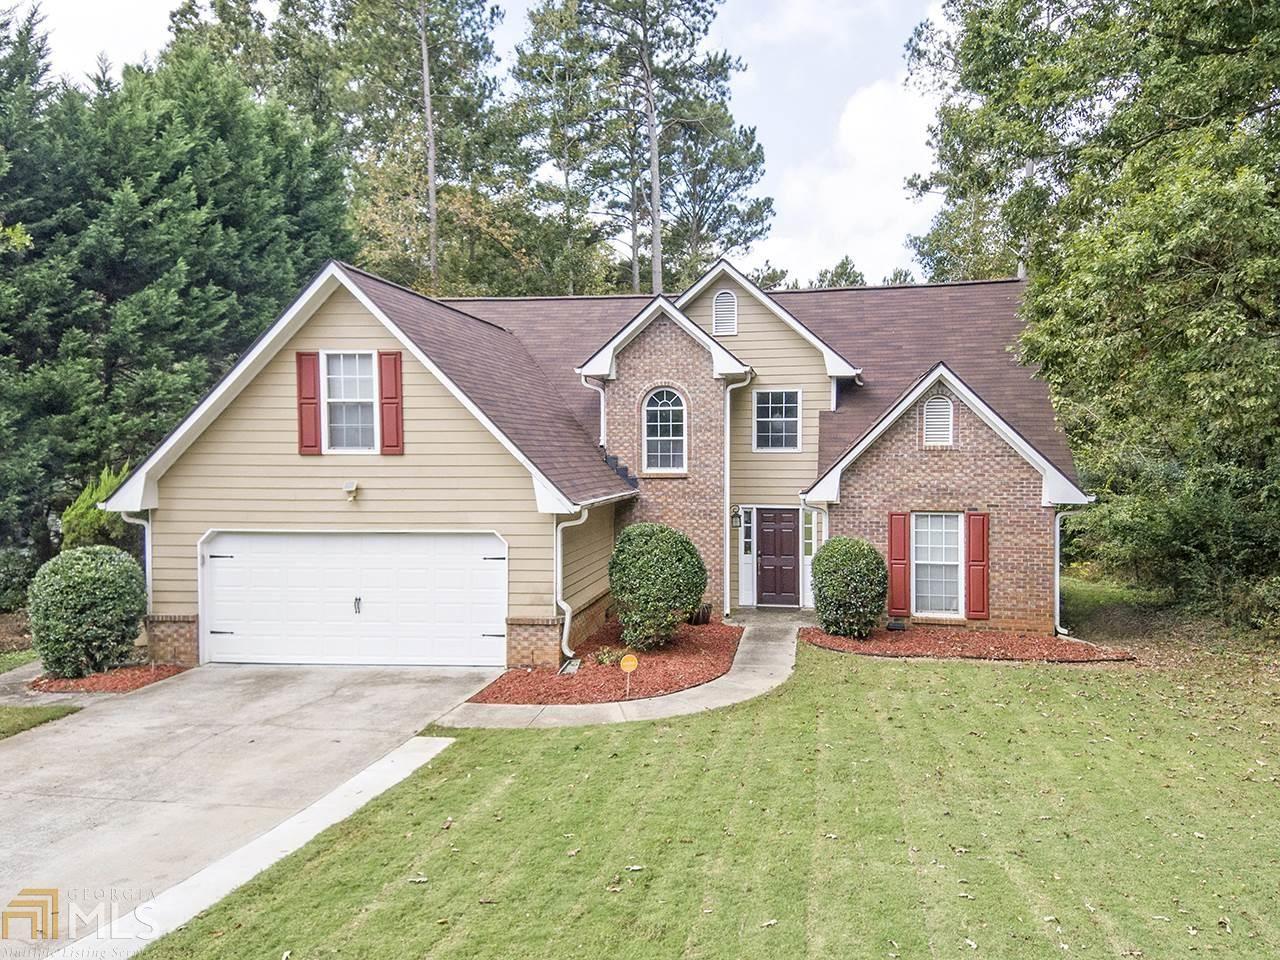 374 Grove Hill Dr, Stockbridge, GA 30281 - MLS#: 8878473